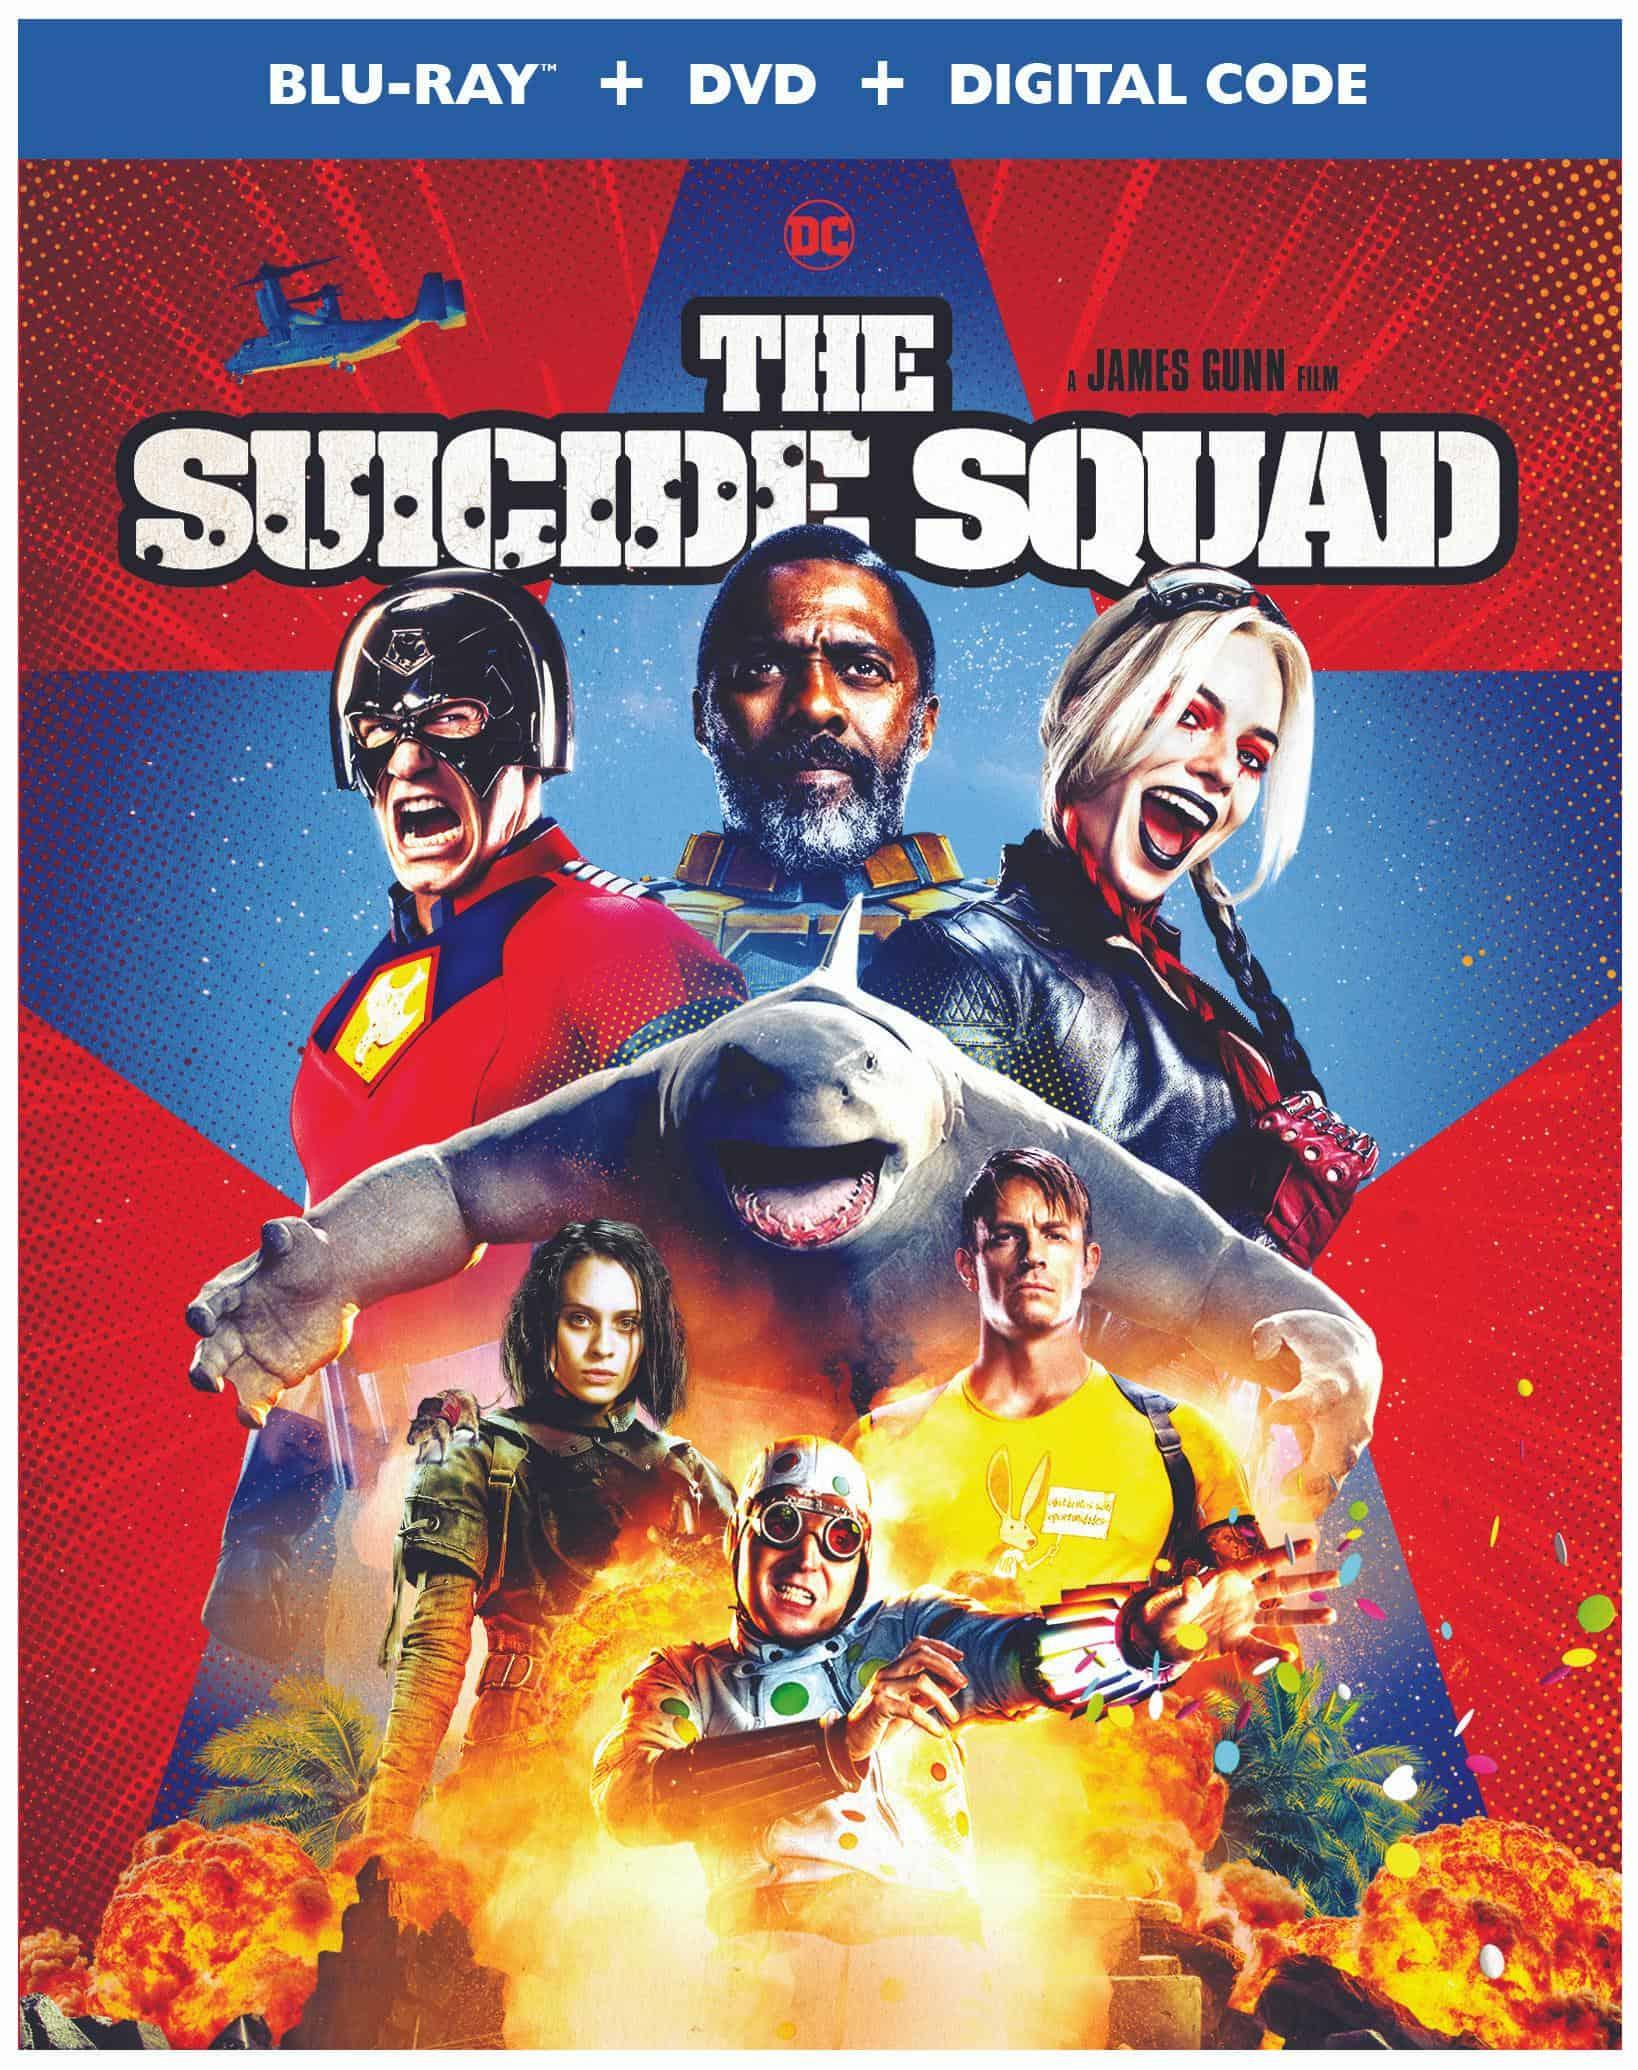 The Suicide Squad Bluray Cover